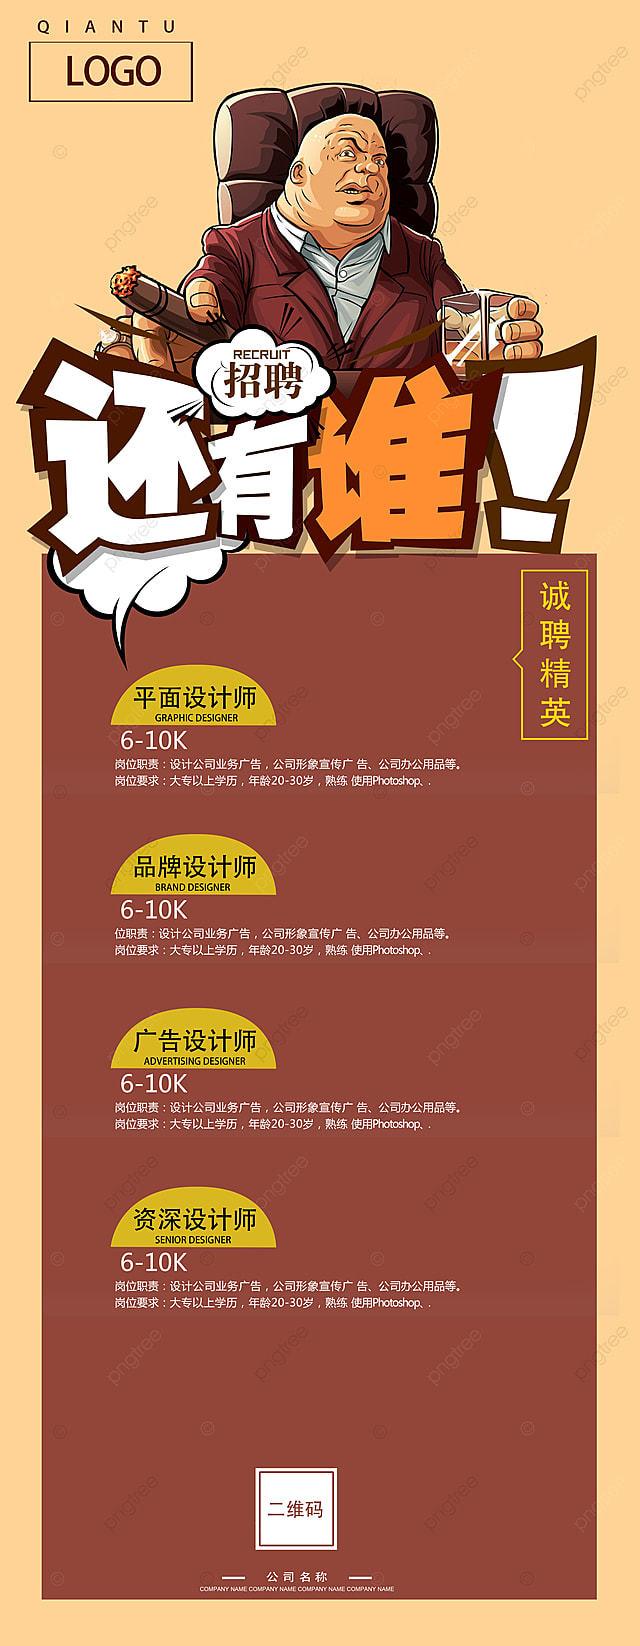 Exhibition Stand Poster Design : Creative recruitment poster designer exhibition stand job